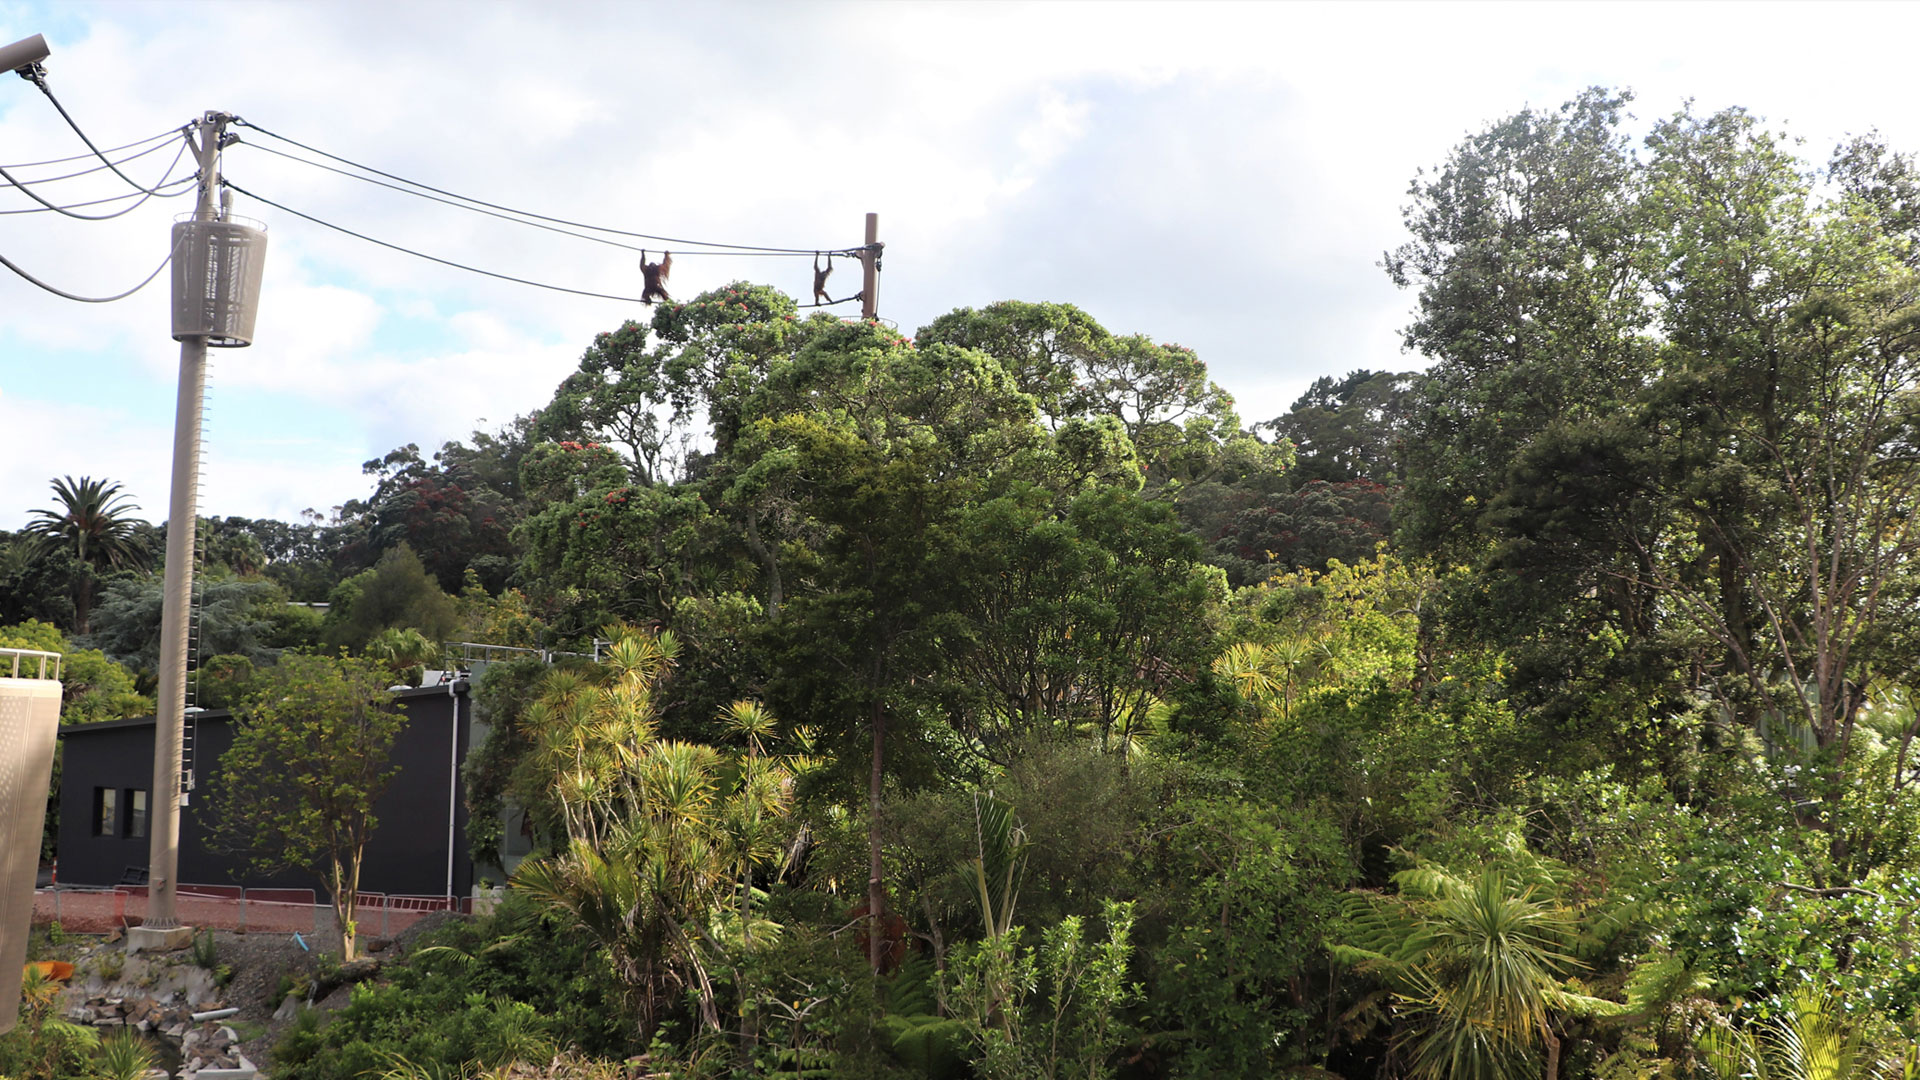 https://rfacdn.nz/zoo/assets/media/orangutans-aerial-pathways-gallery-2.jpg